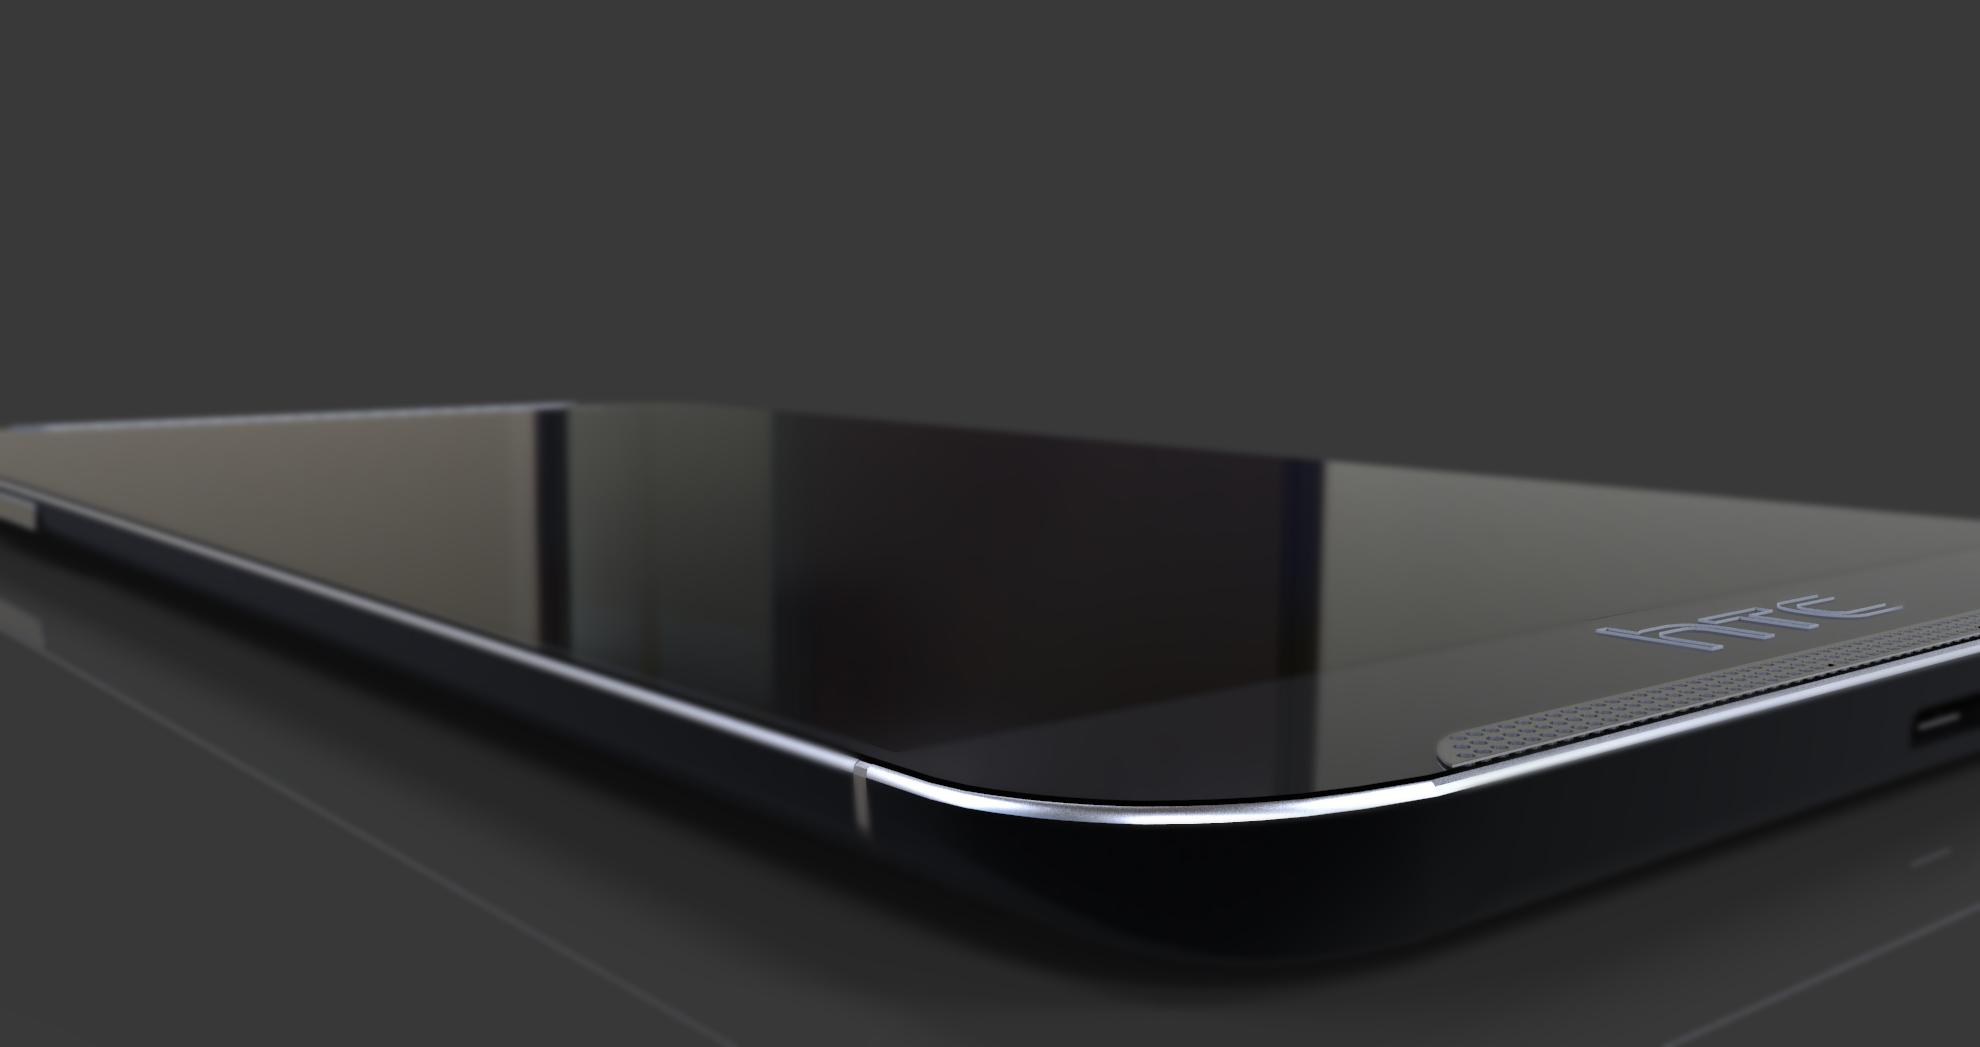 HTC Hima (M9) : les rumeurs continuent de s'affoler